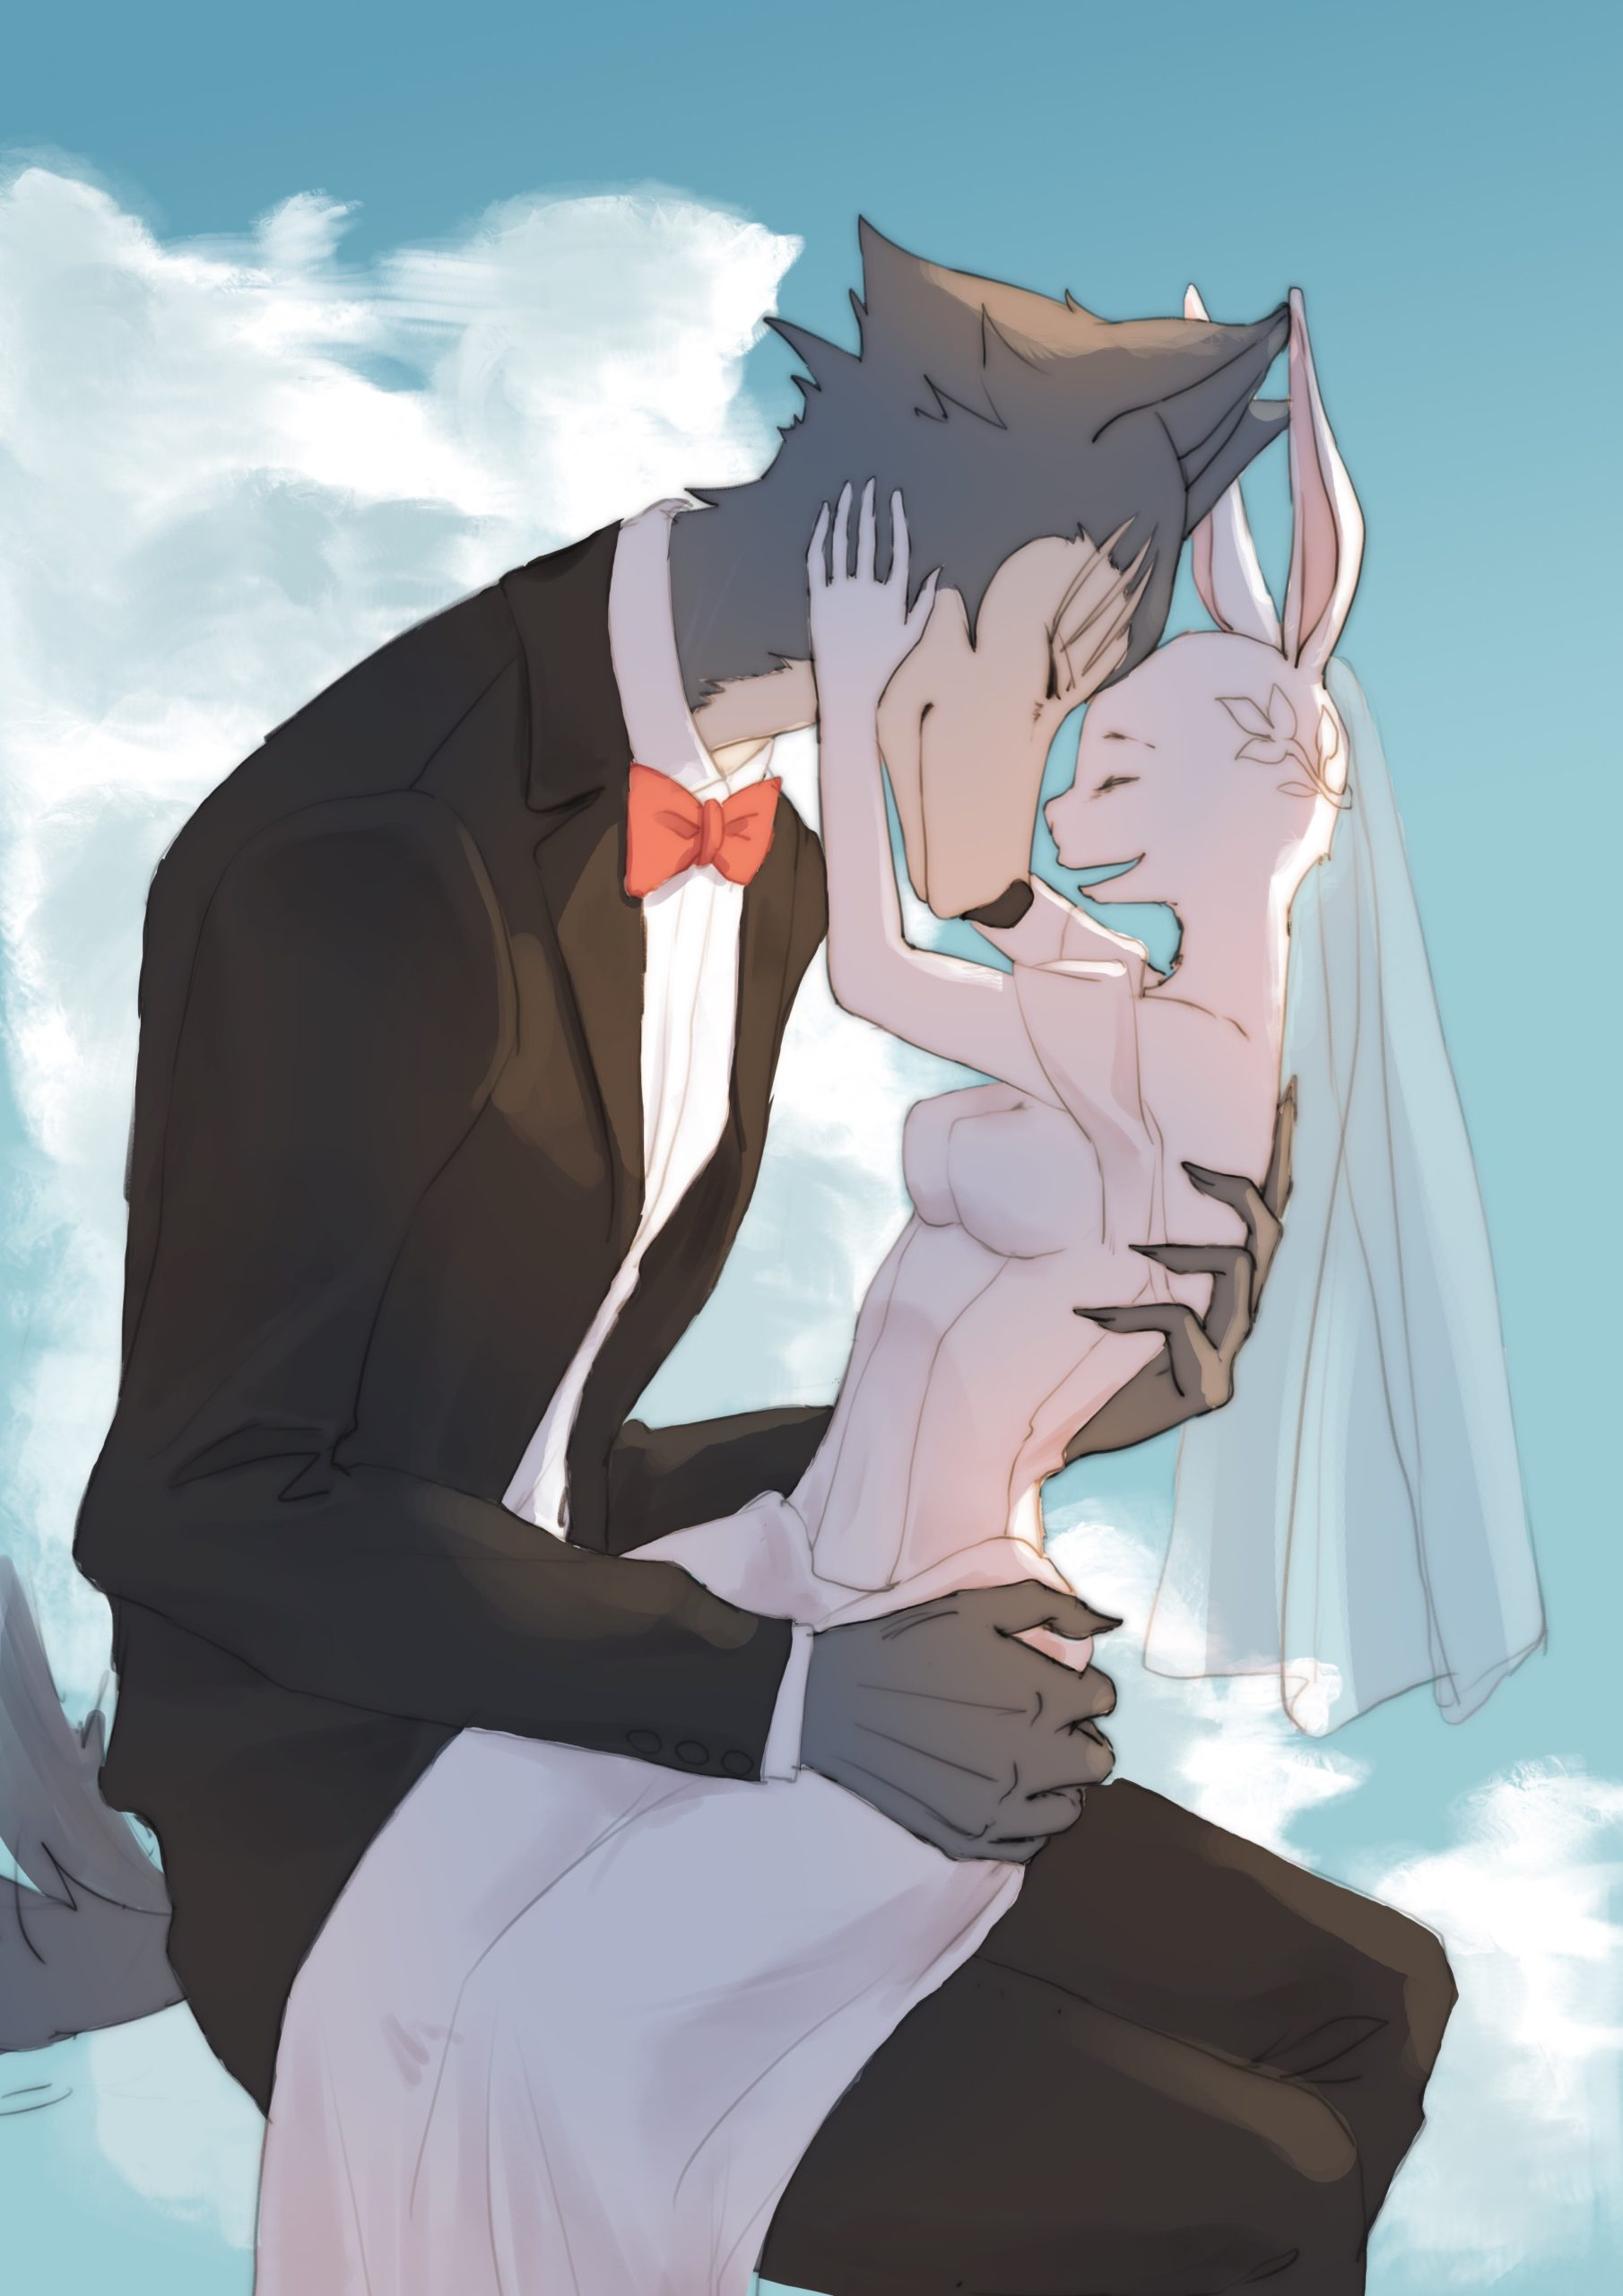 legoshi and haru